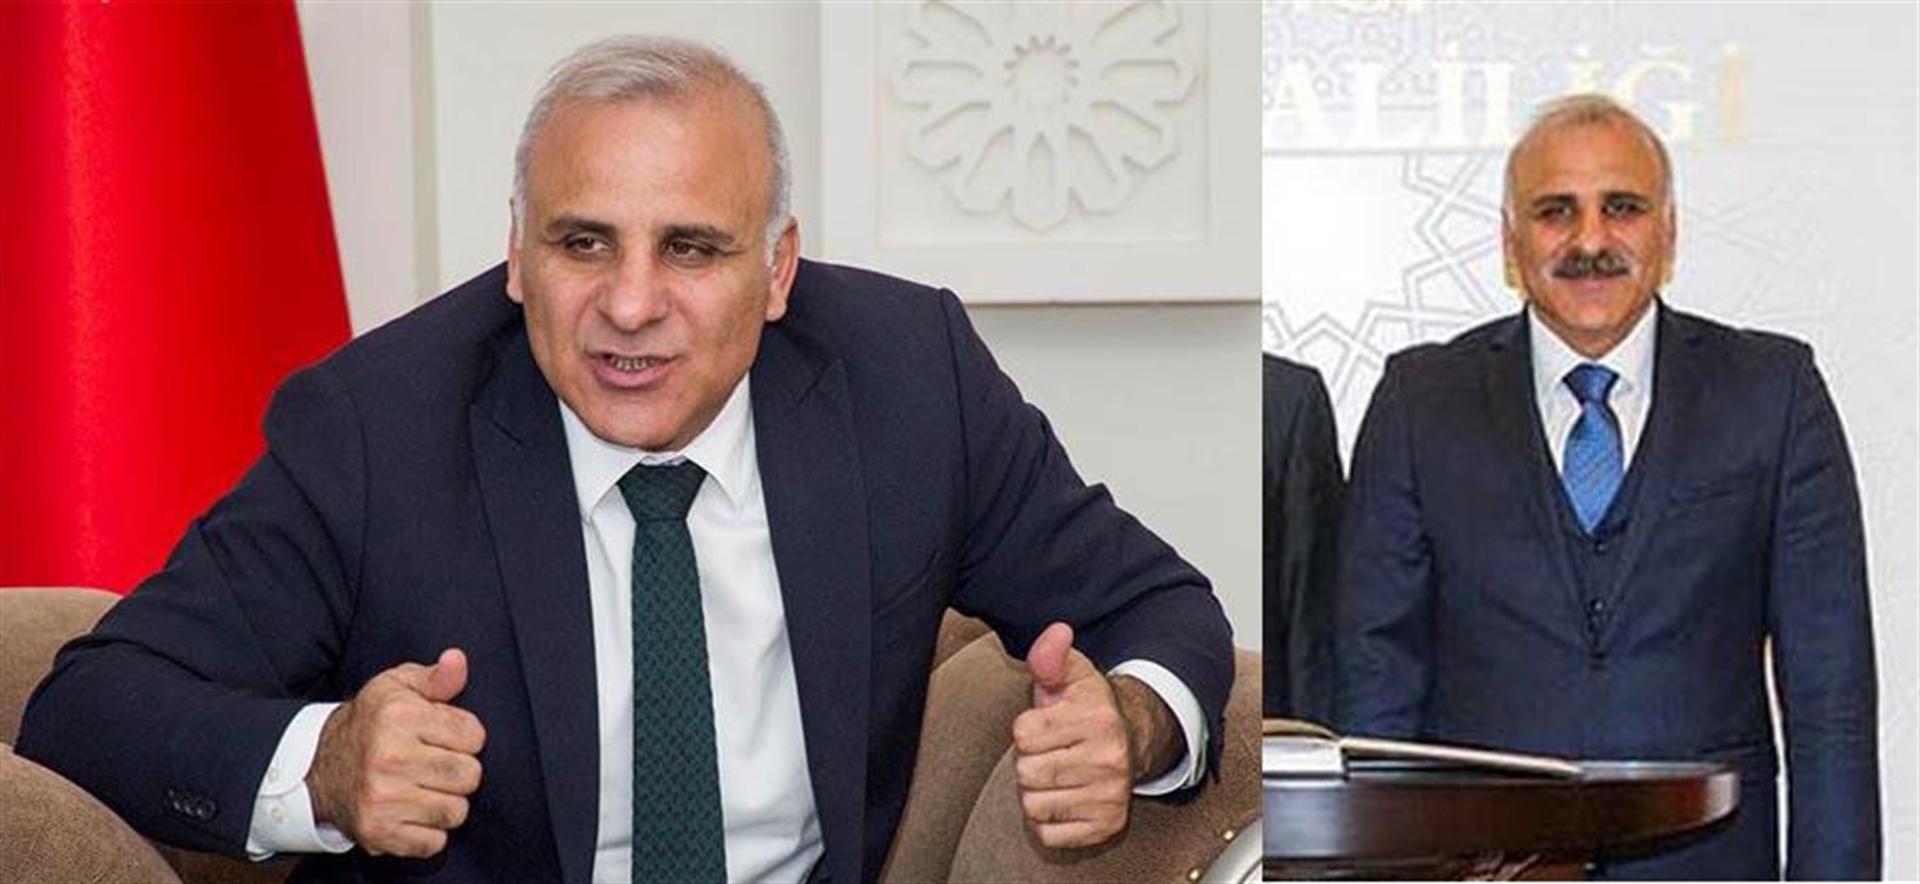 Milyonlarca TL borç bırakıp AKP'den aday oldular